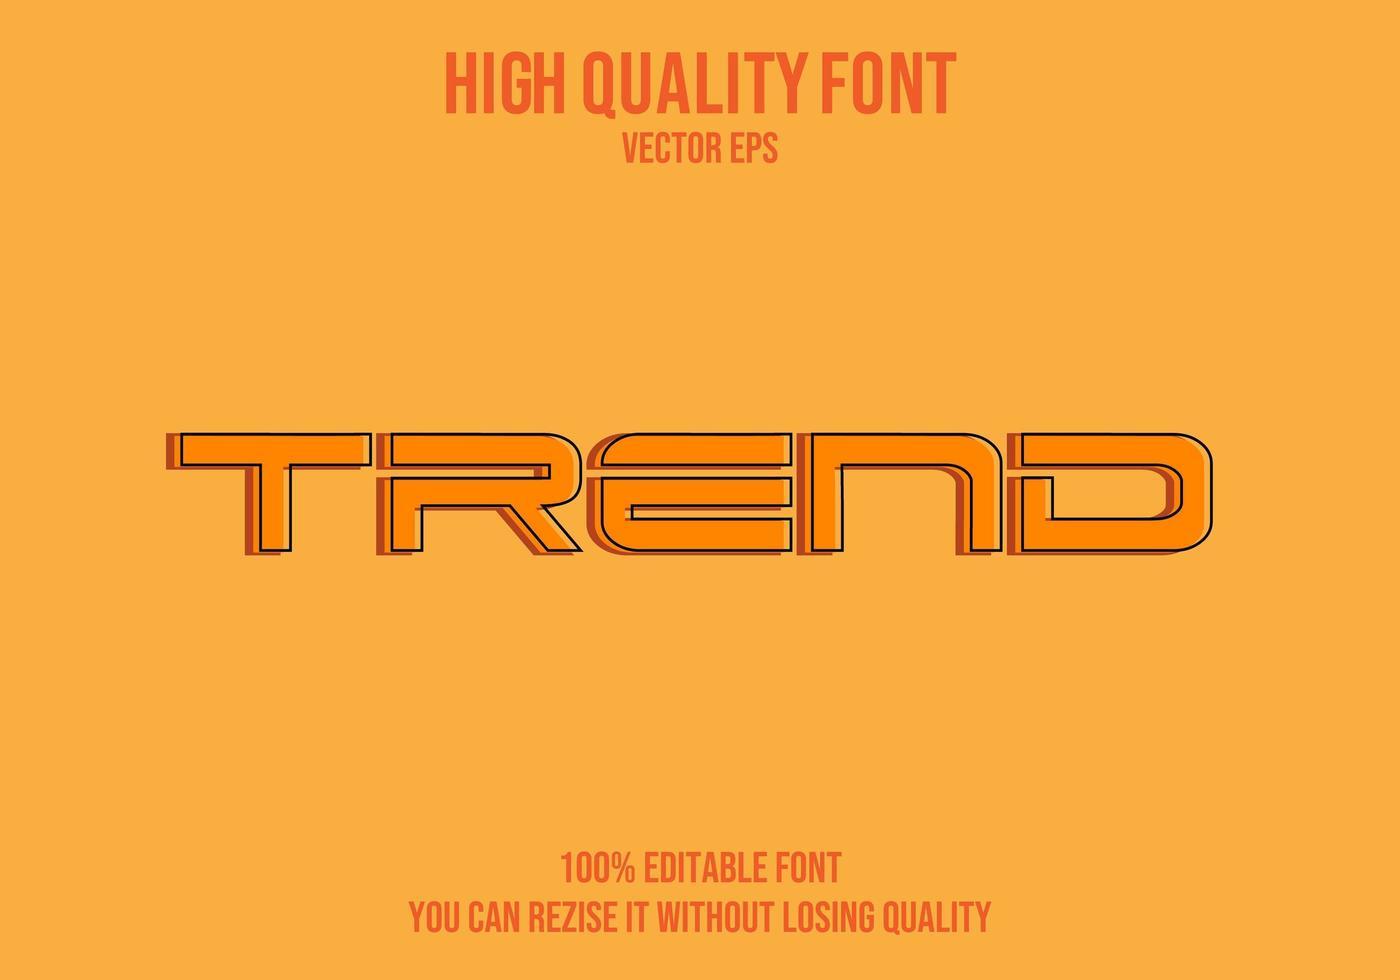 Trend bearbeitbarer Texteffekt vektor